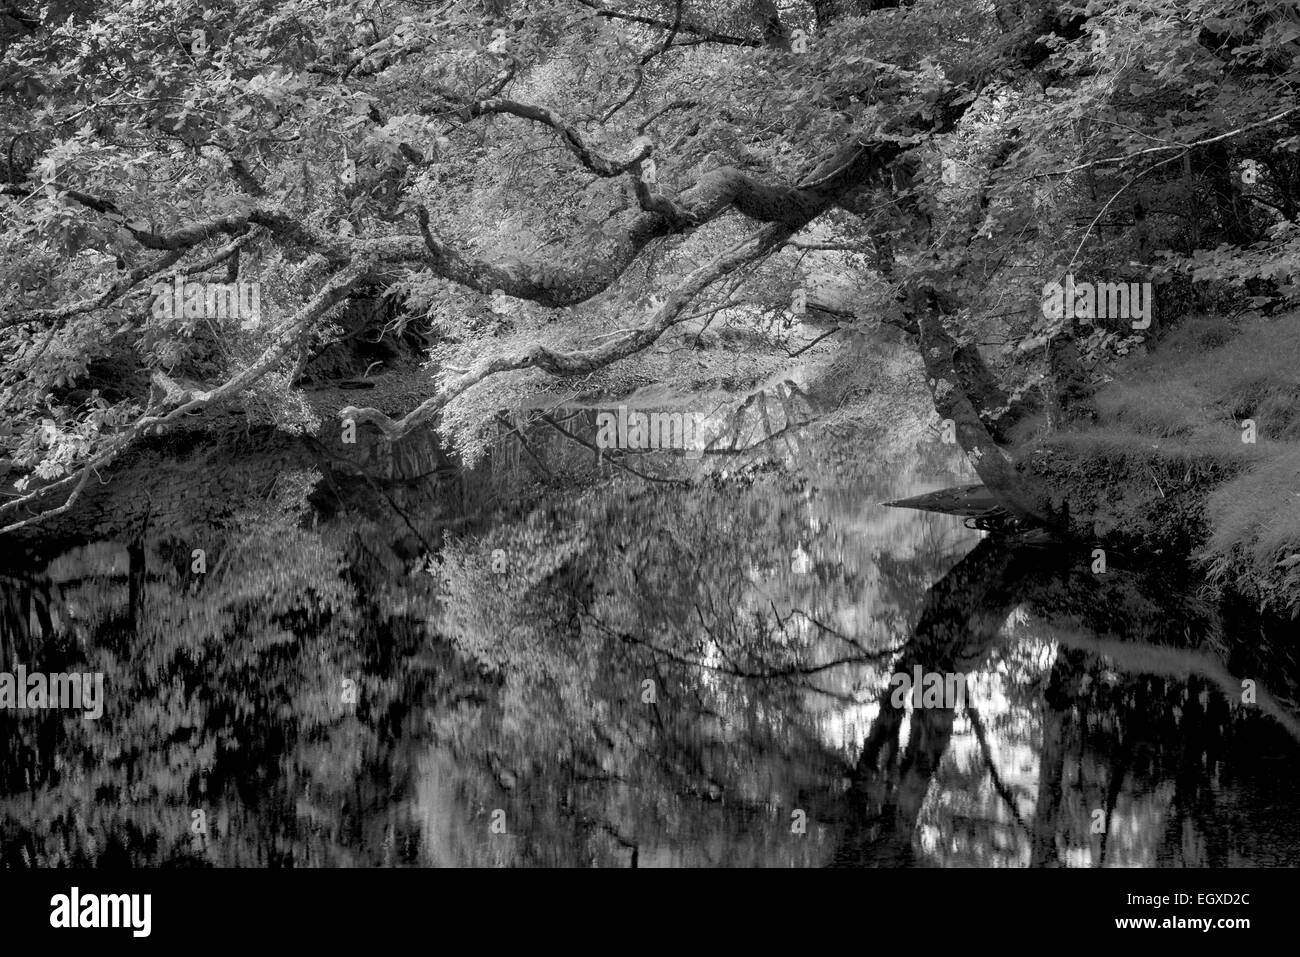 Ruhig ruhigen Gewässer des Gearhmeen Flusses, Nationalpark Killarney, Irland Stockbild